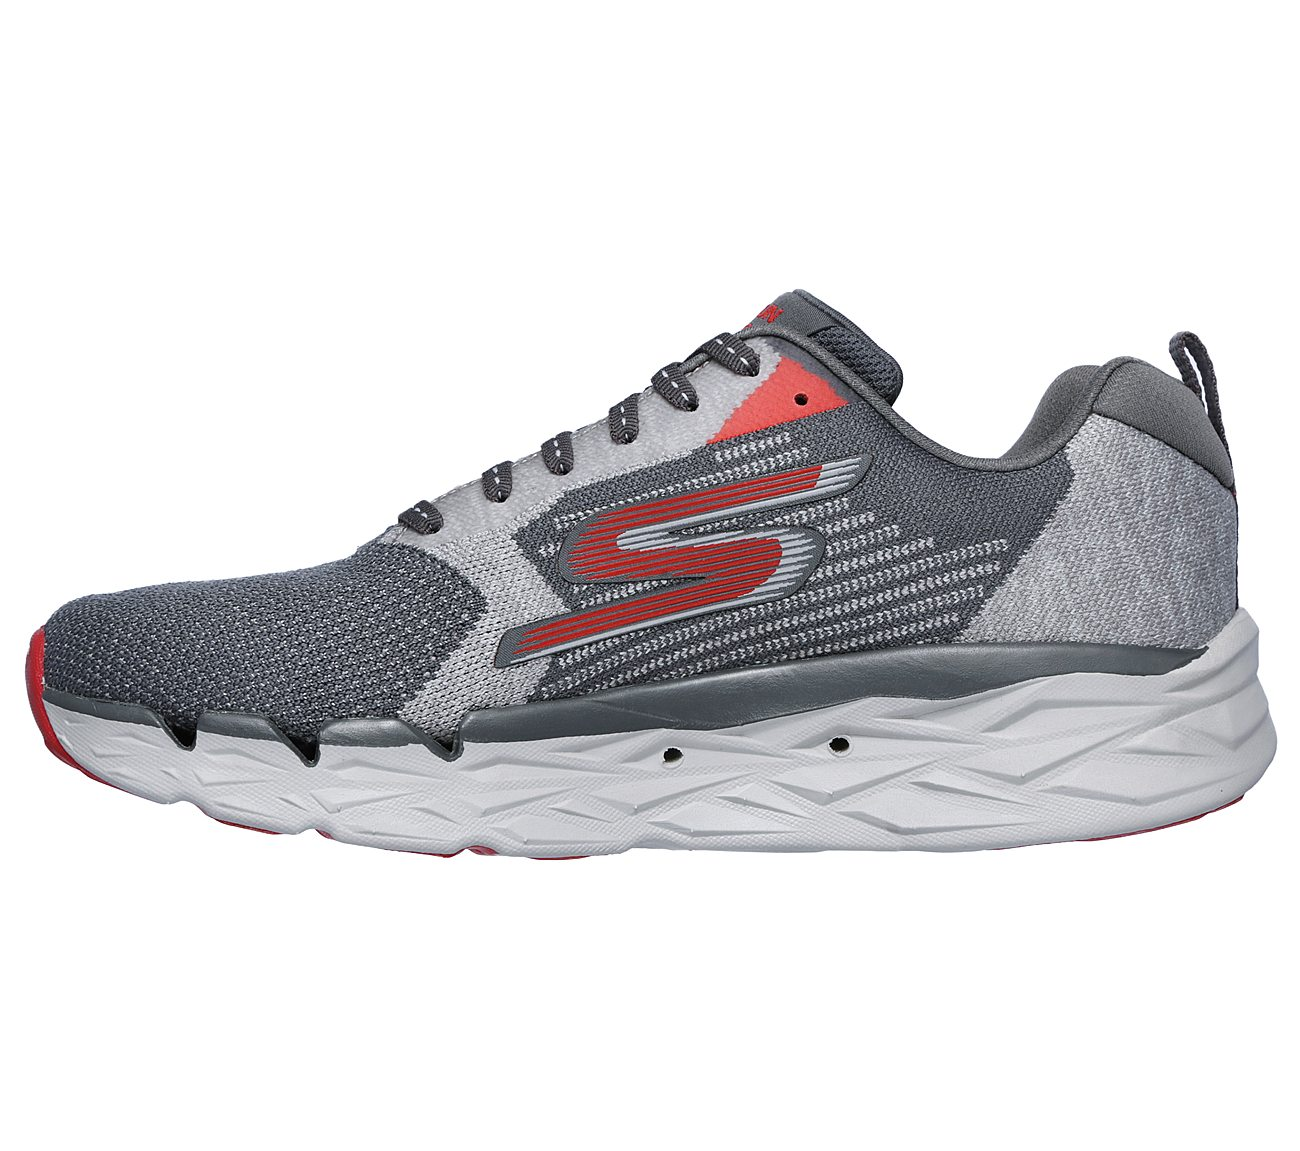 volatilidad loto Nos vemos mañana  Buy SKECHERS Skechers GOrun MaxRoad 3 Ultra Skechers Performance Shoes